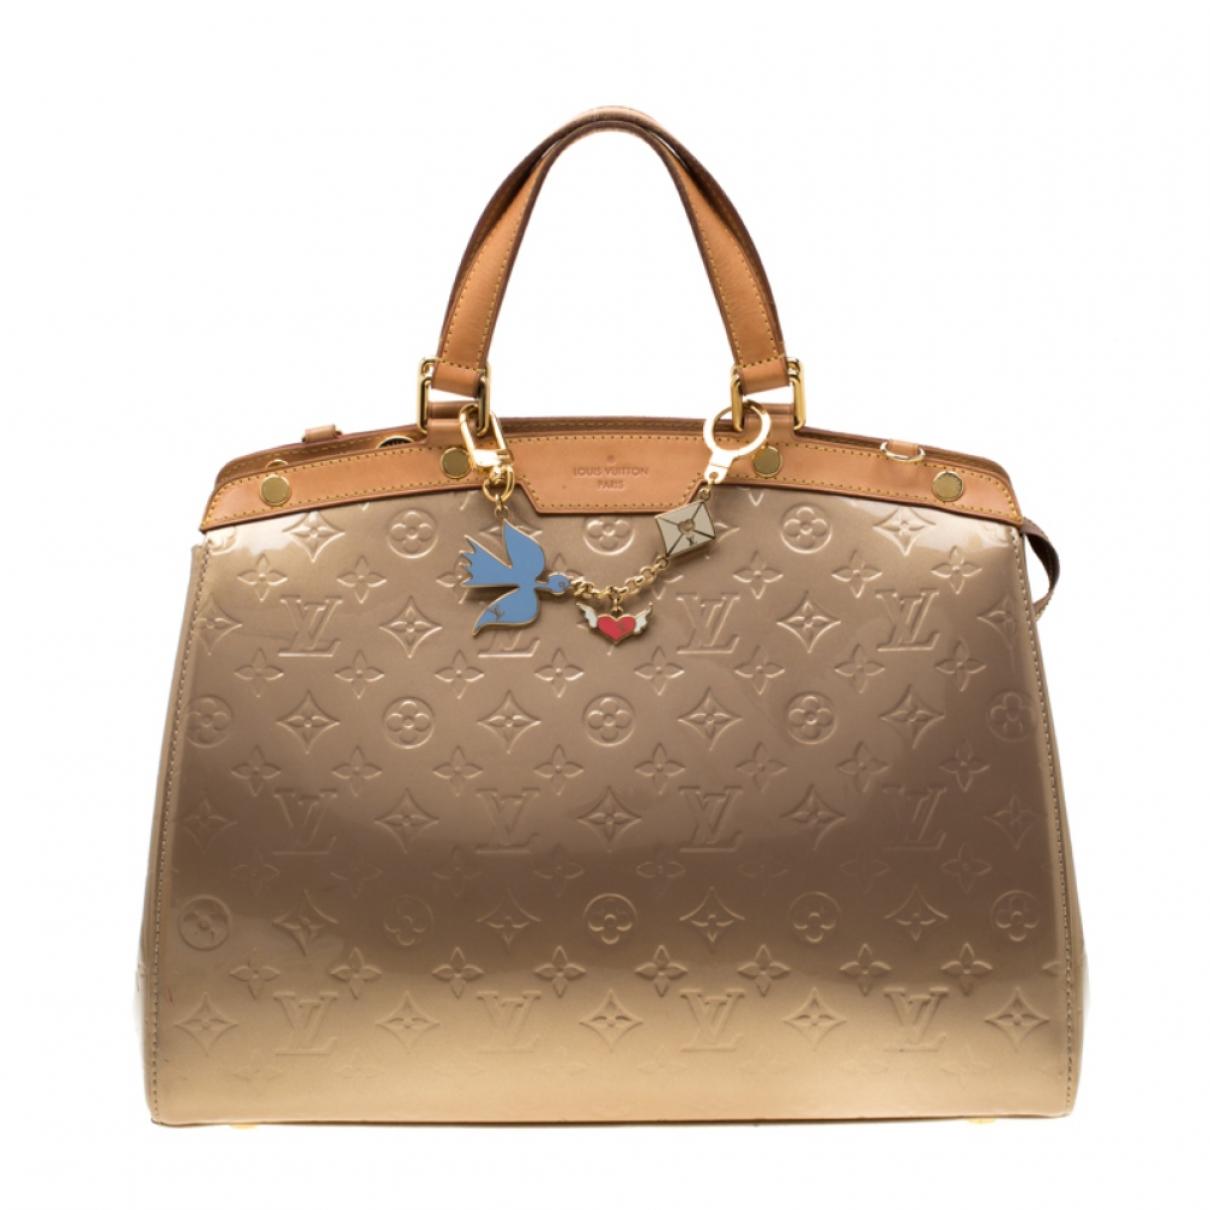 Louis Vuitton Brea Handtasche in  Beige Lackleder